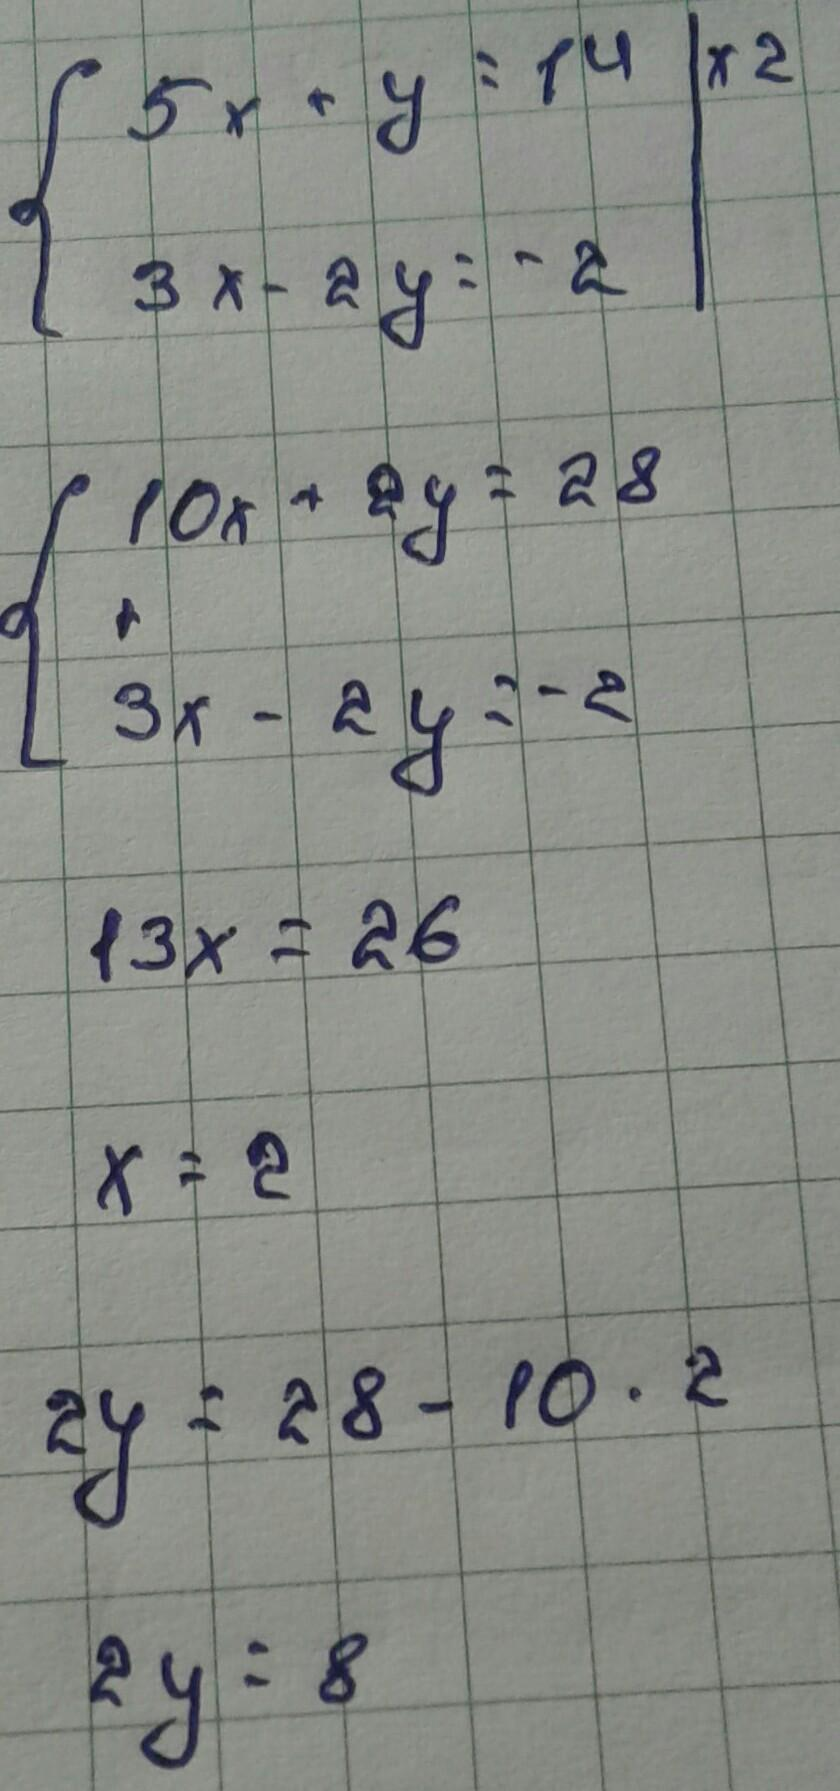 Решите систему уравнений  заранее спасибо